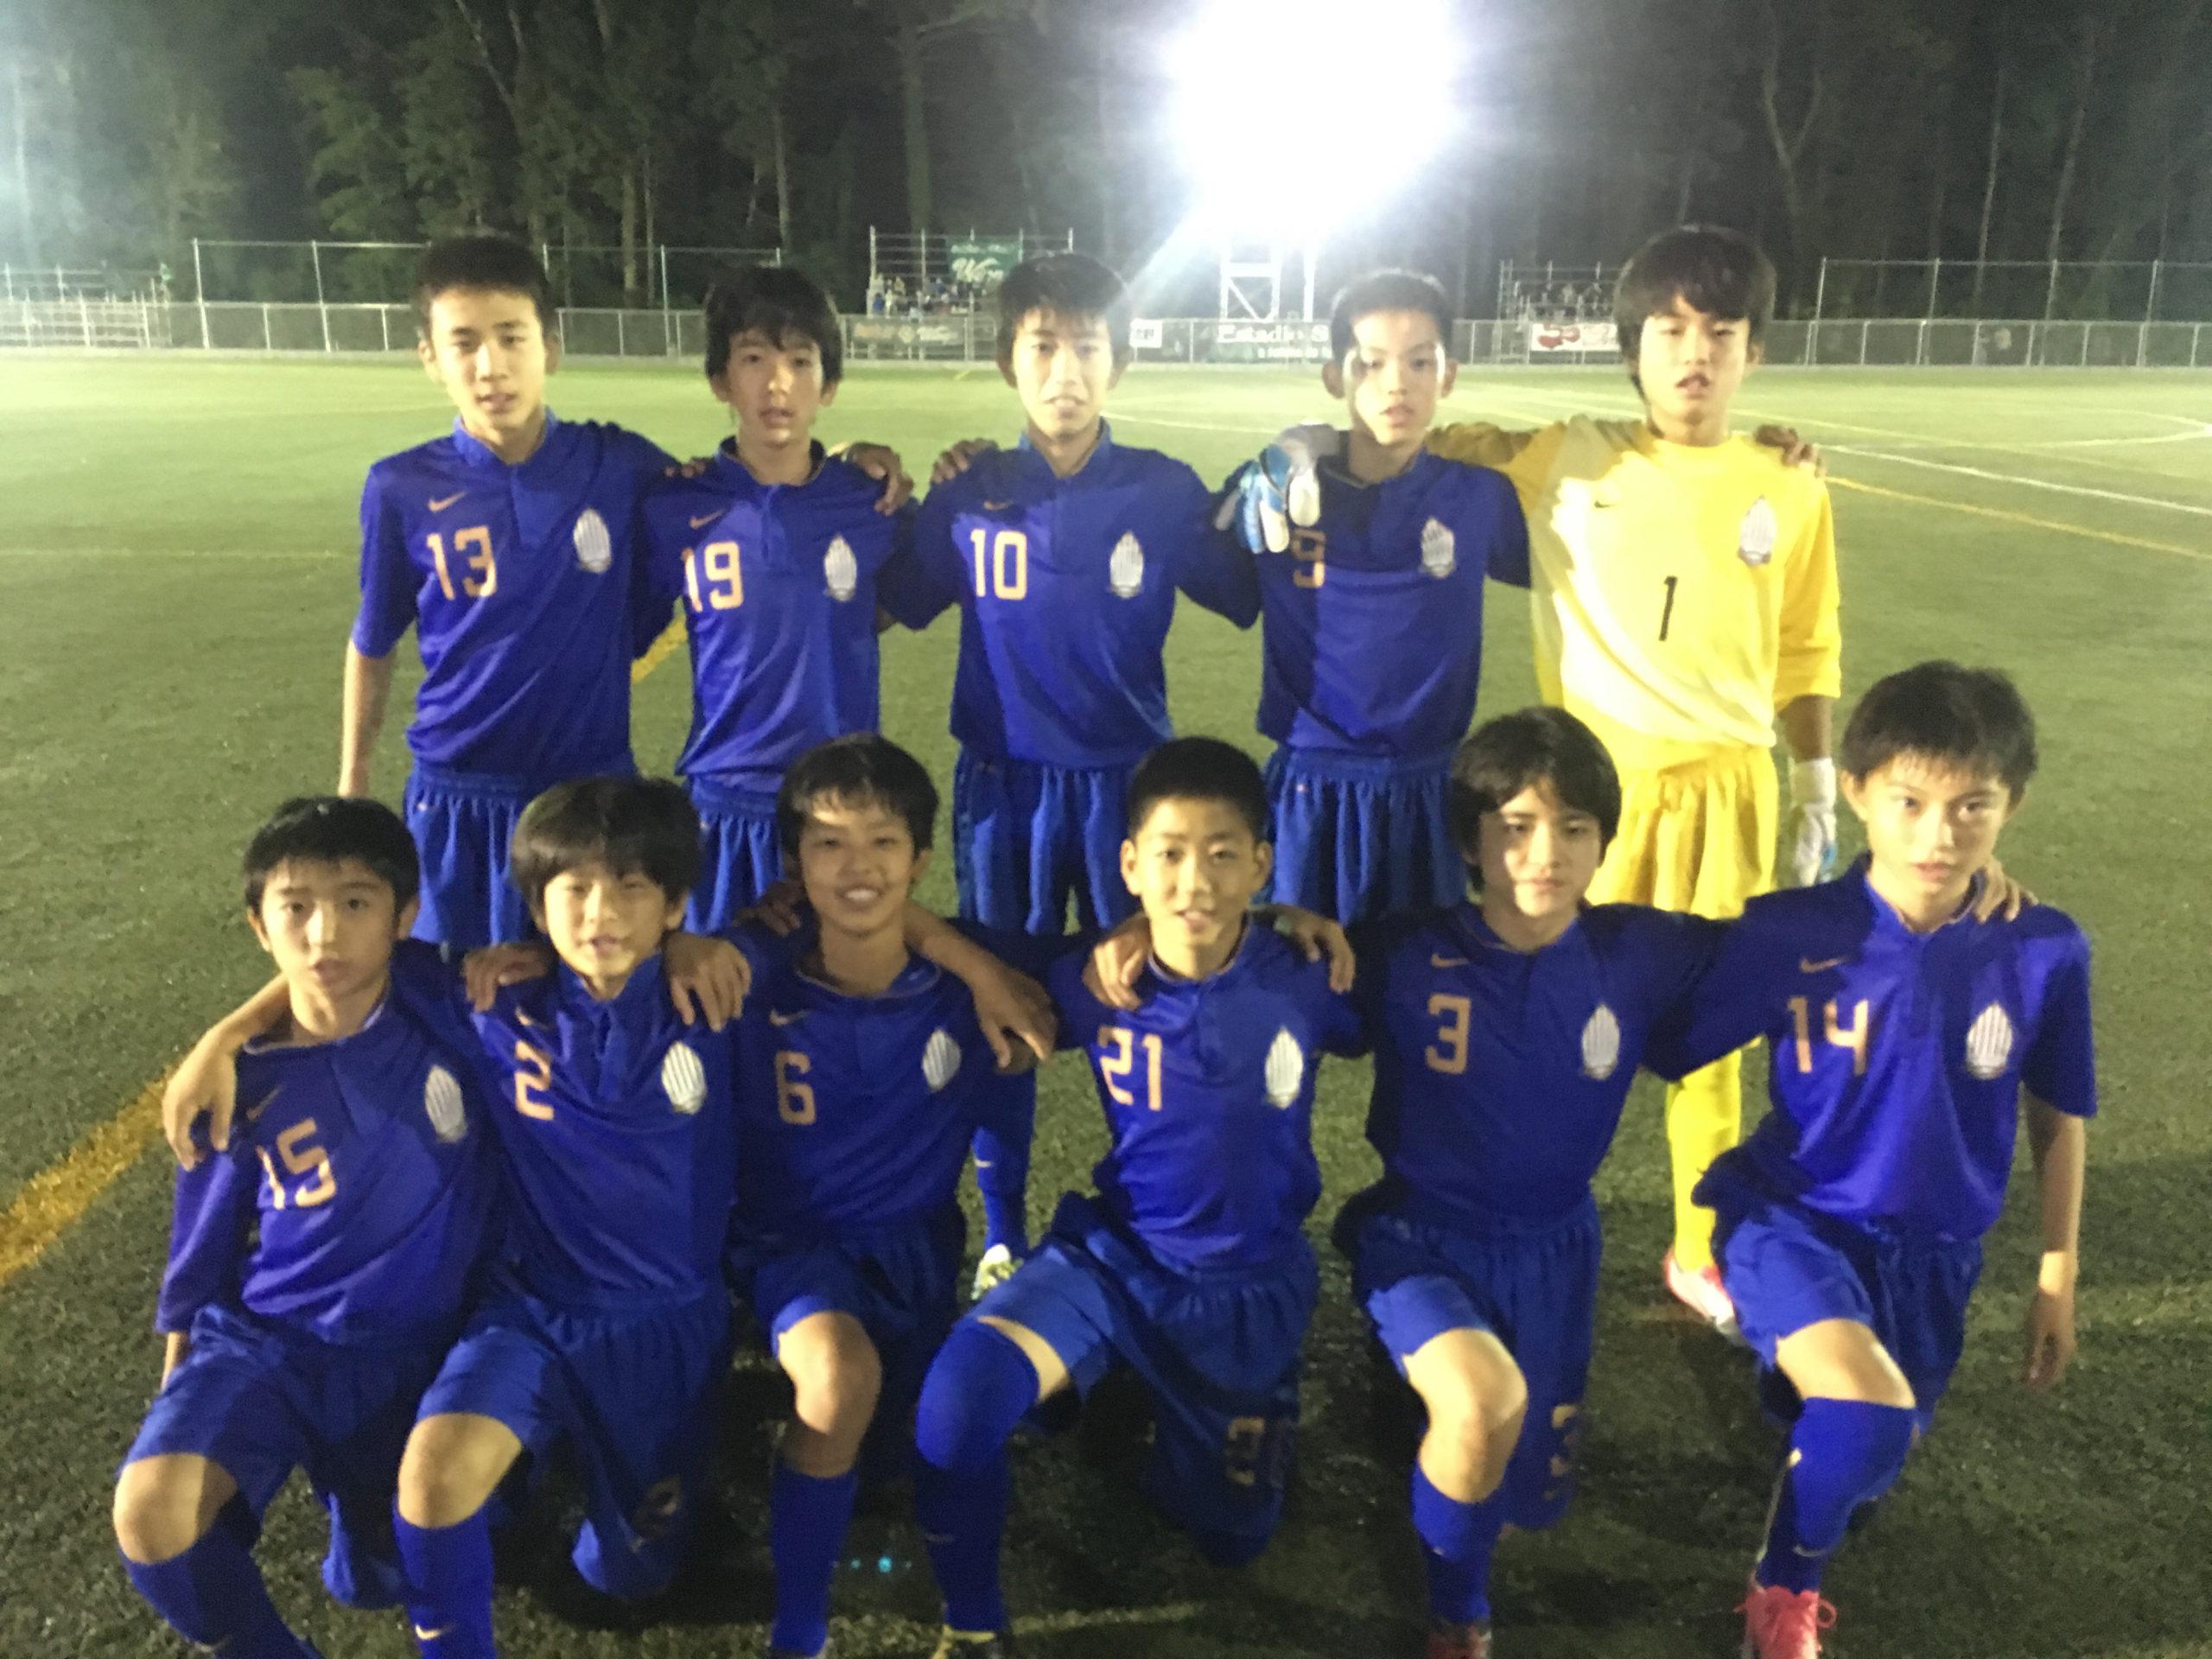 【U13】第8回 千葉県ユース(U-13)サッカーリーグ 1部リーグ【第5節】